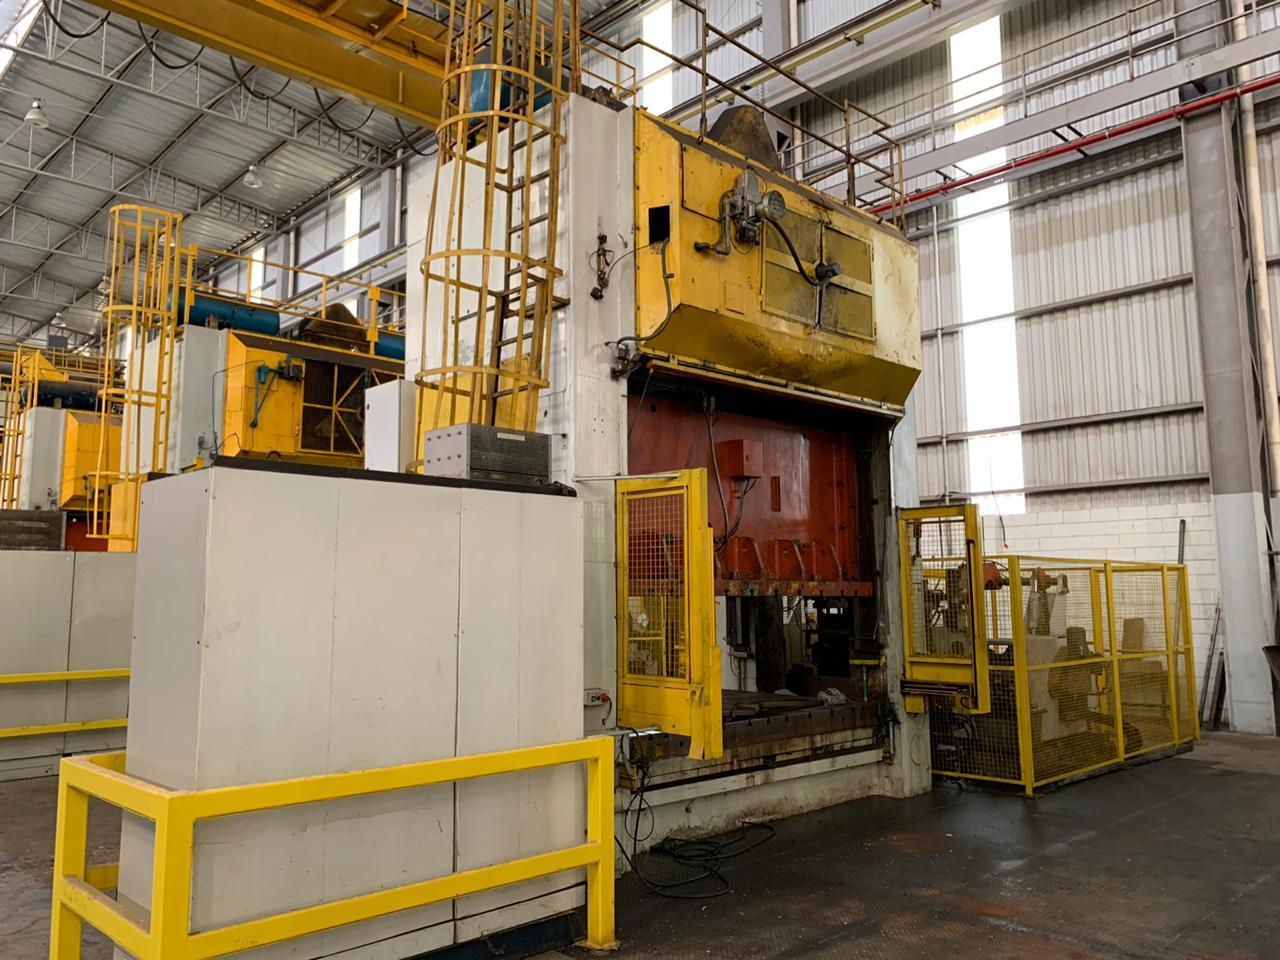 Prensa Excêntrica Fagor 630 ton 3000mm x 1800mm #1204  - AEG Comercial